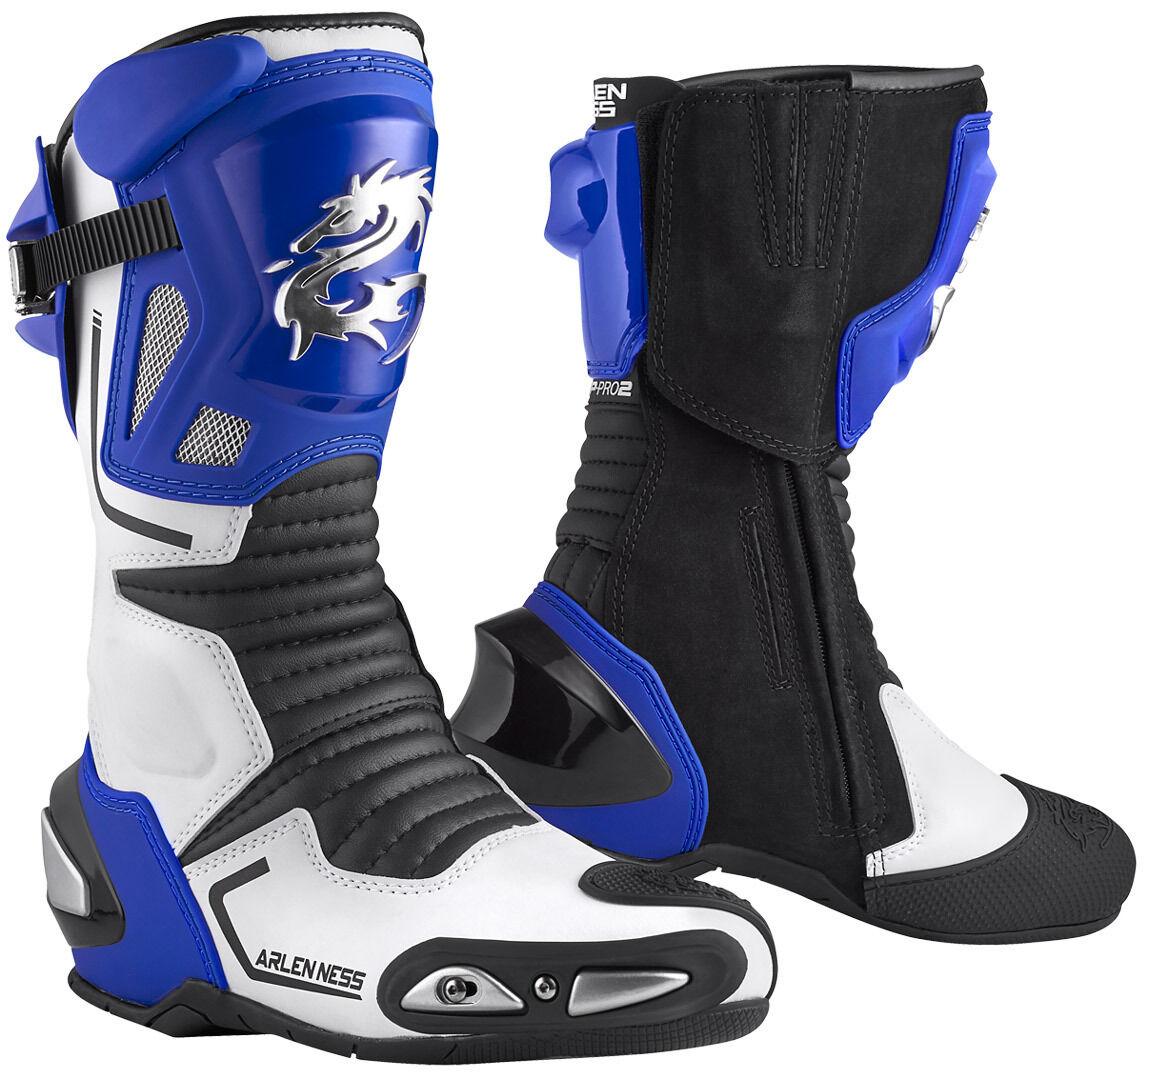 Arlen Ness Sugello Bottes de moto Noir Blanc Bleu taille : 48